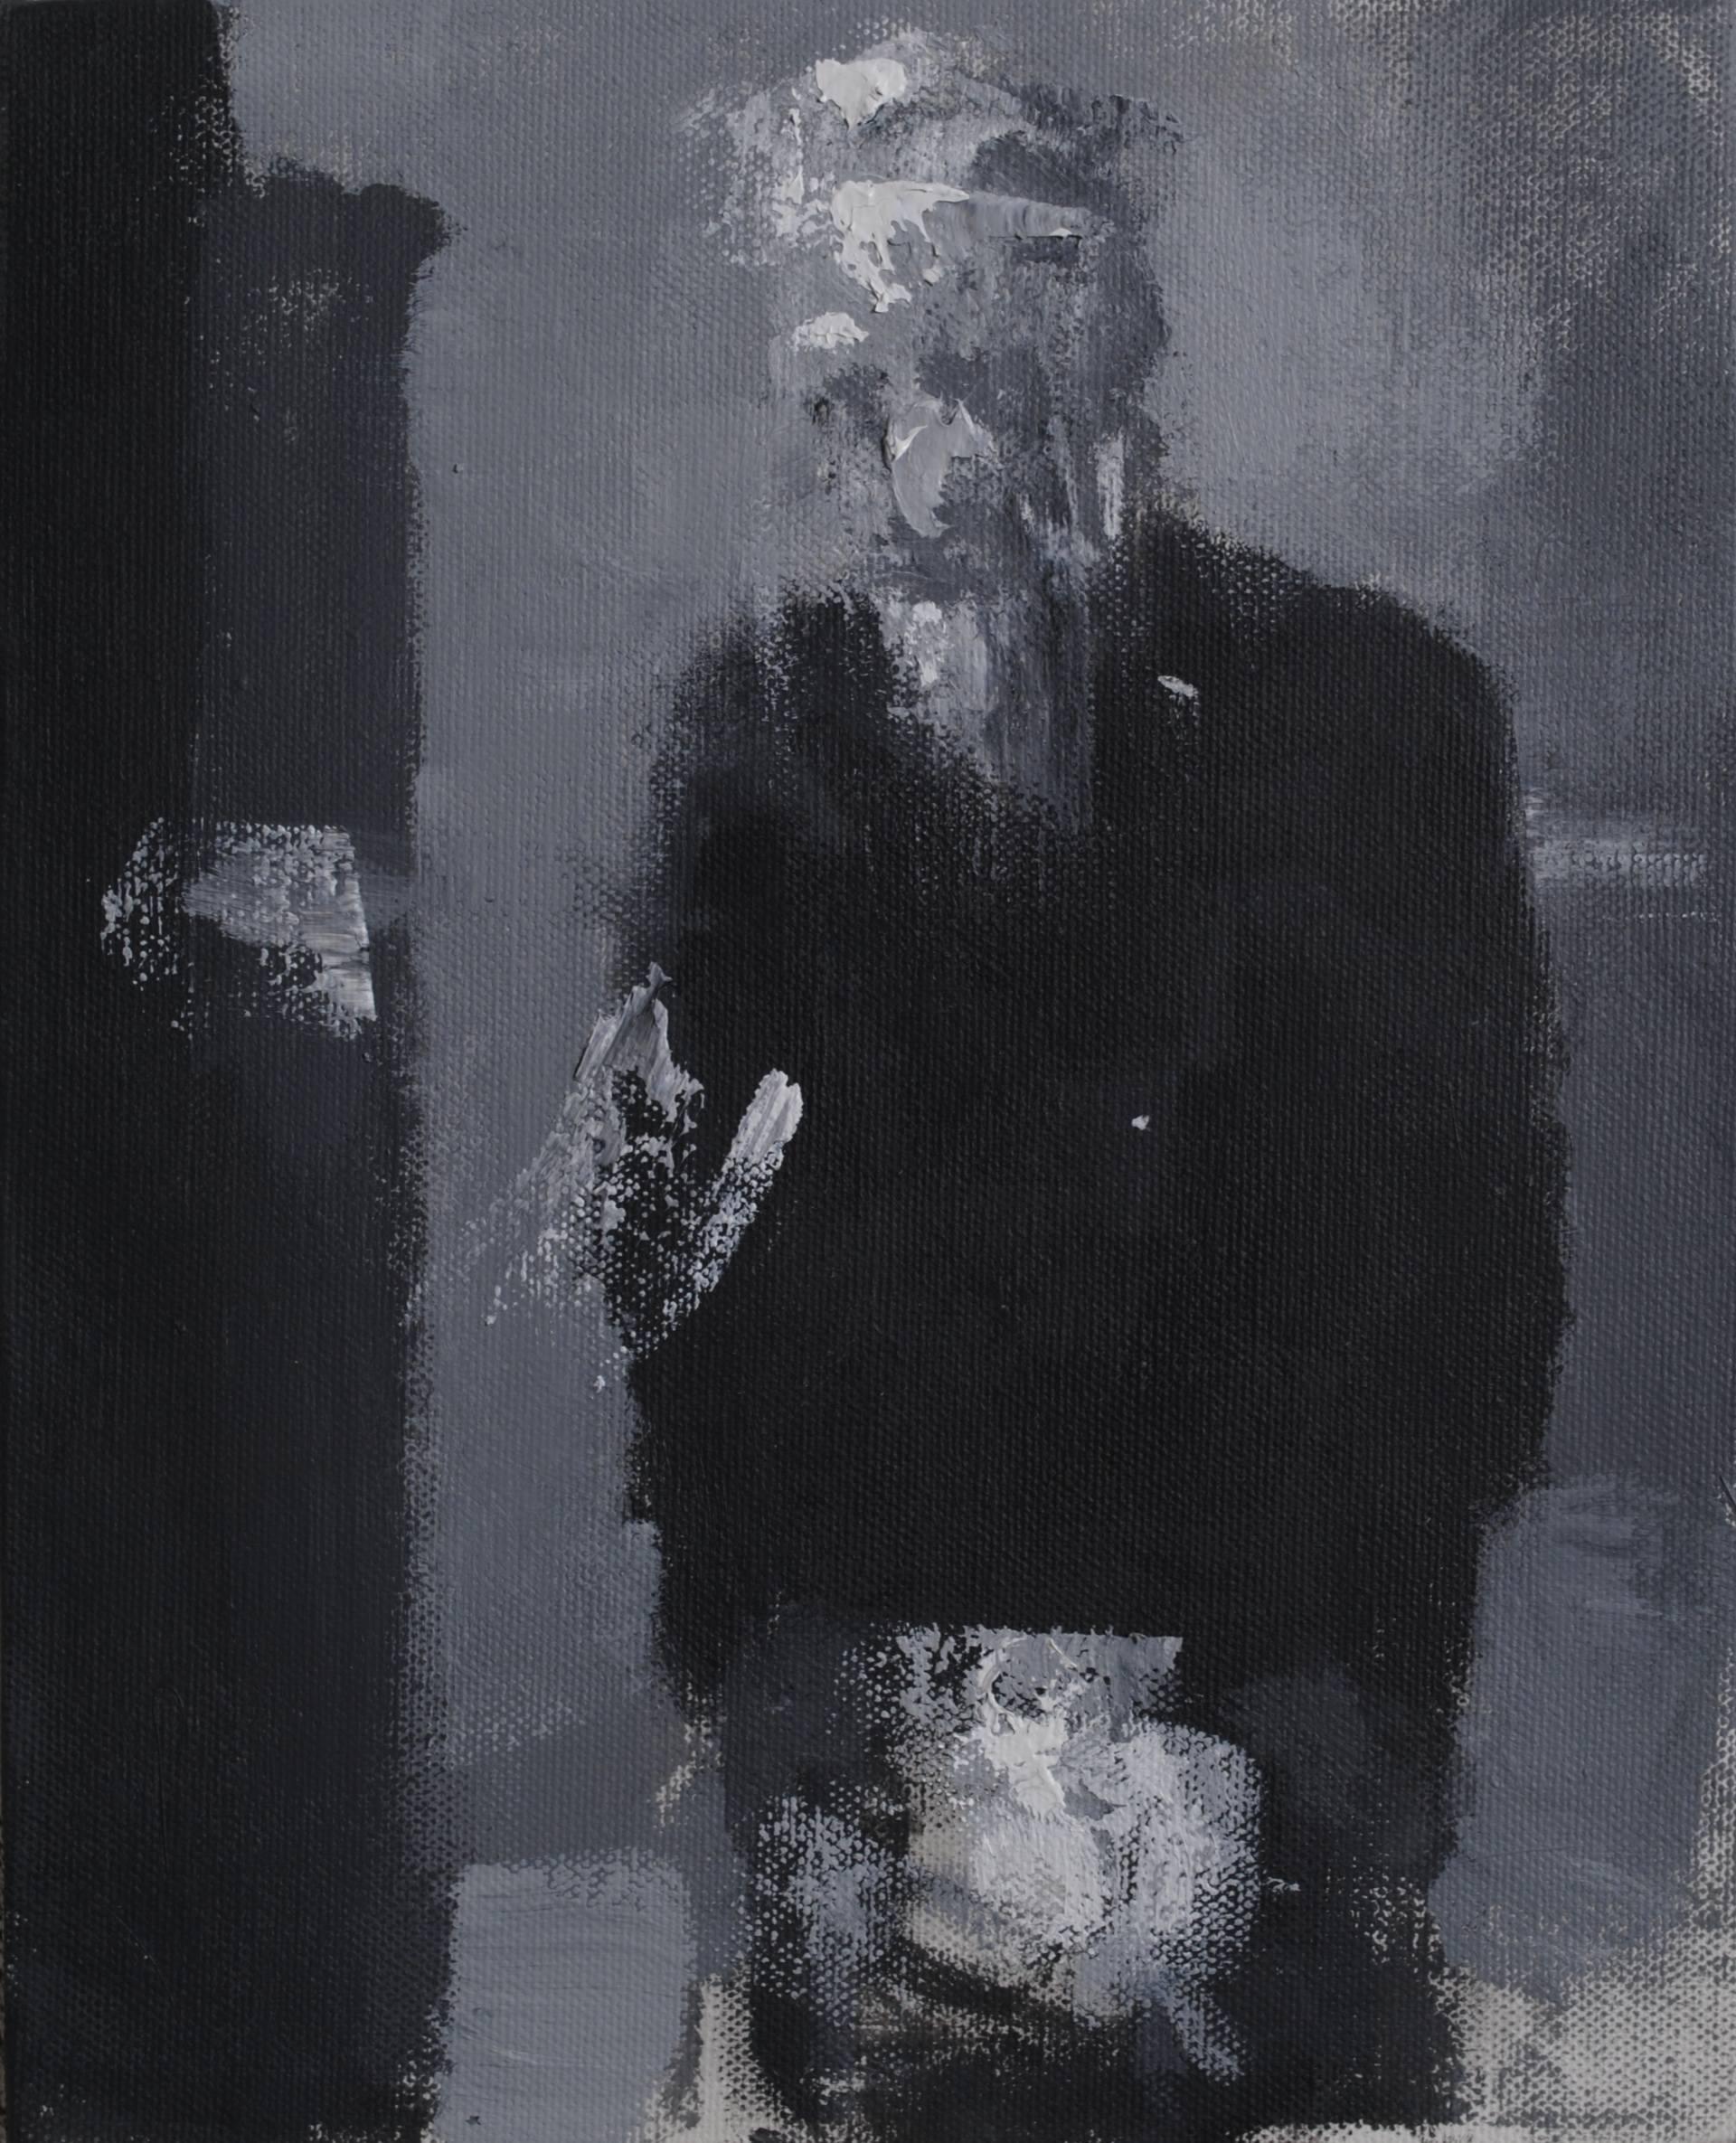 Trotsky 2 by Jean-Luc Almond